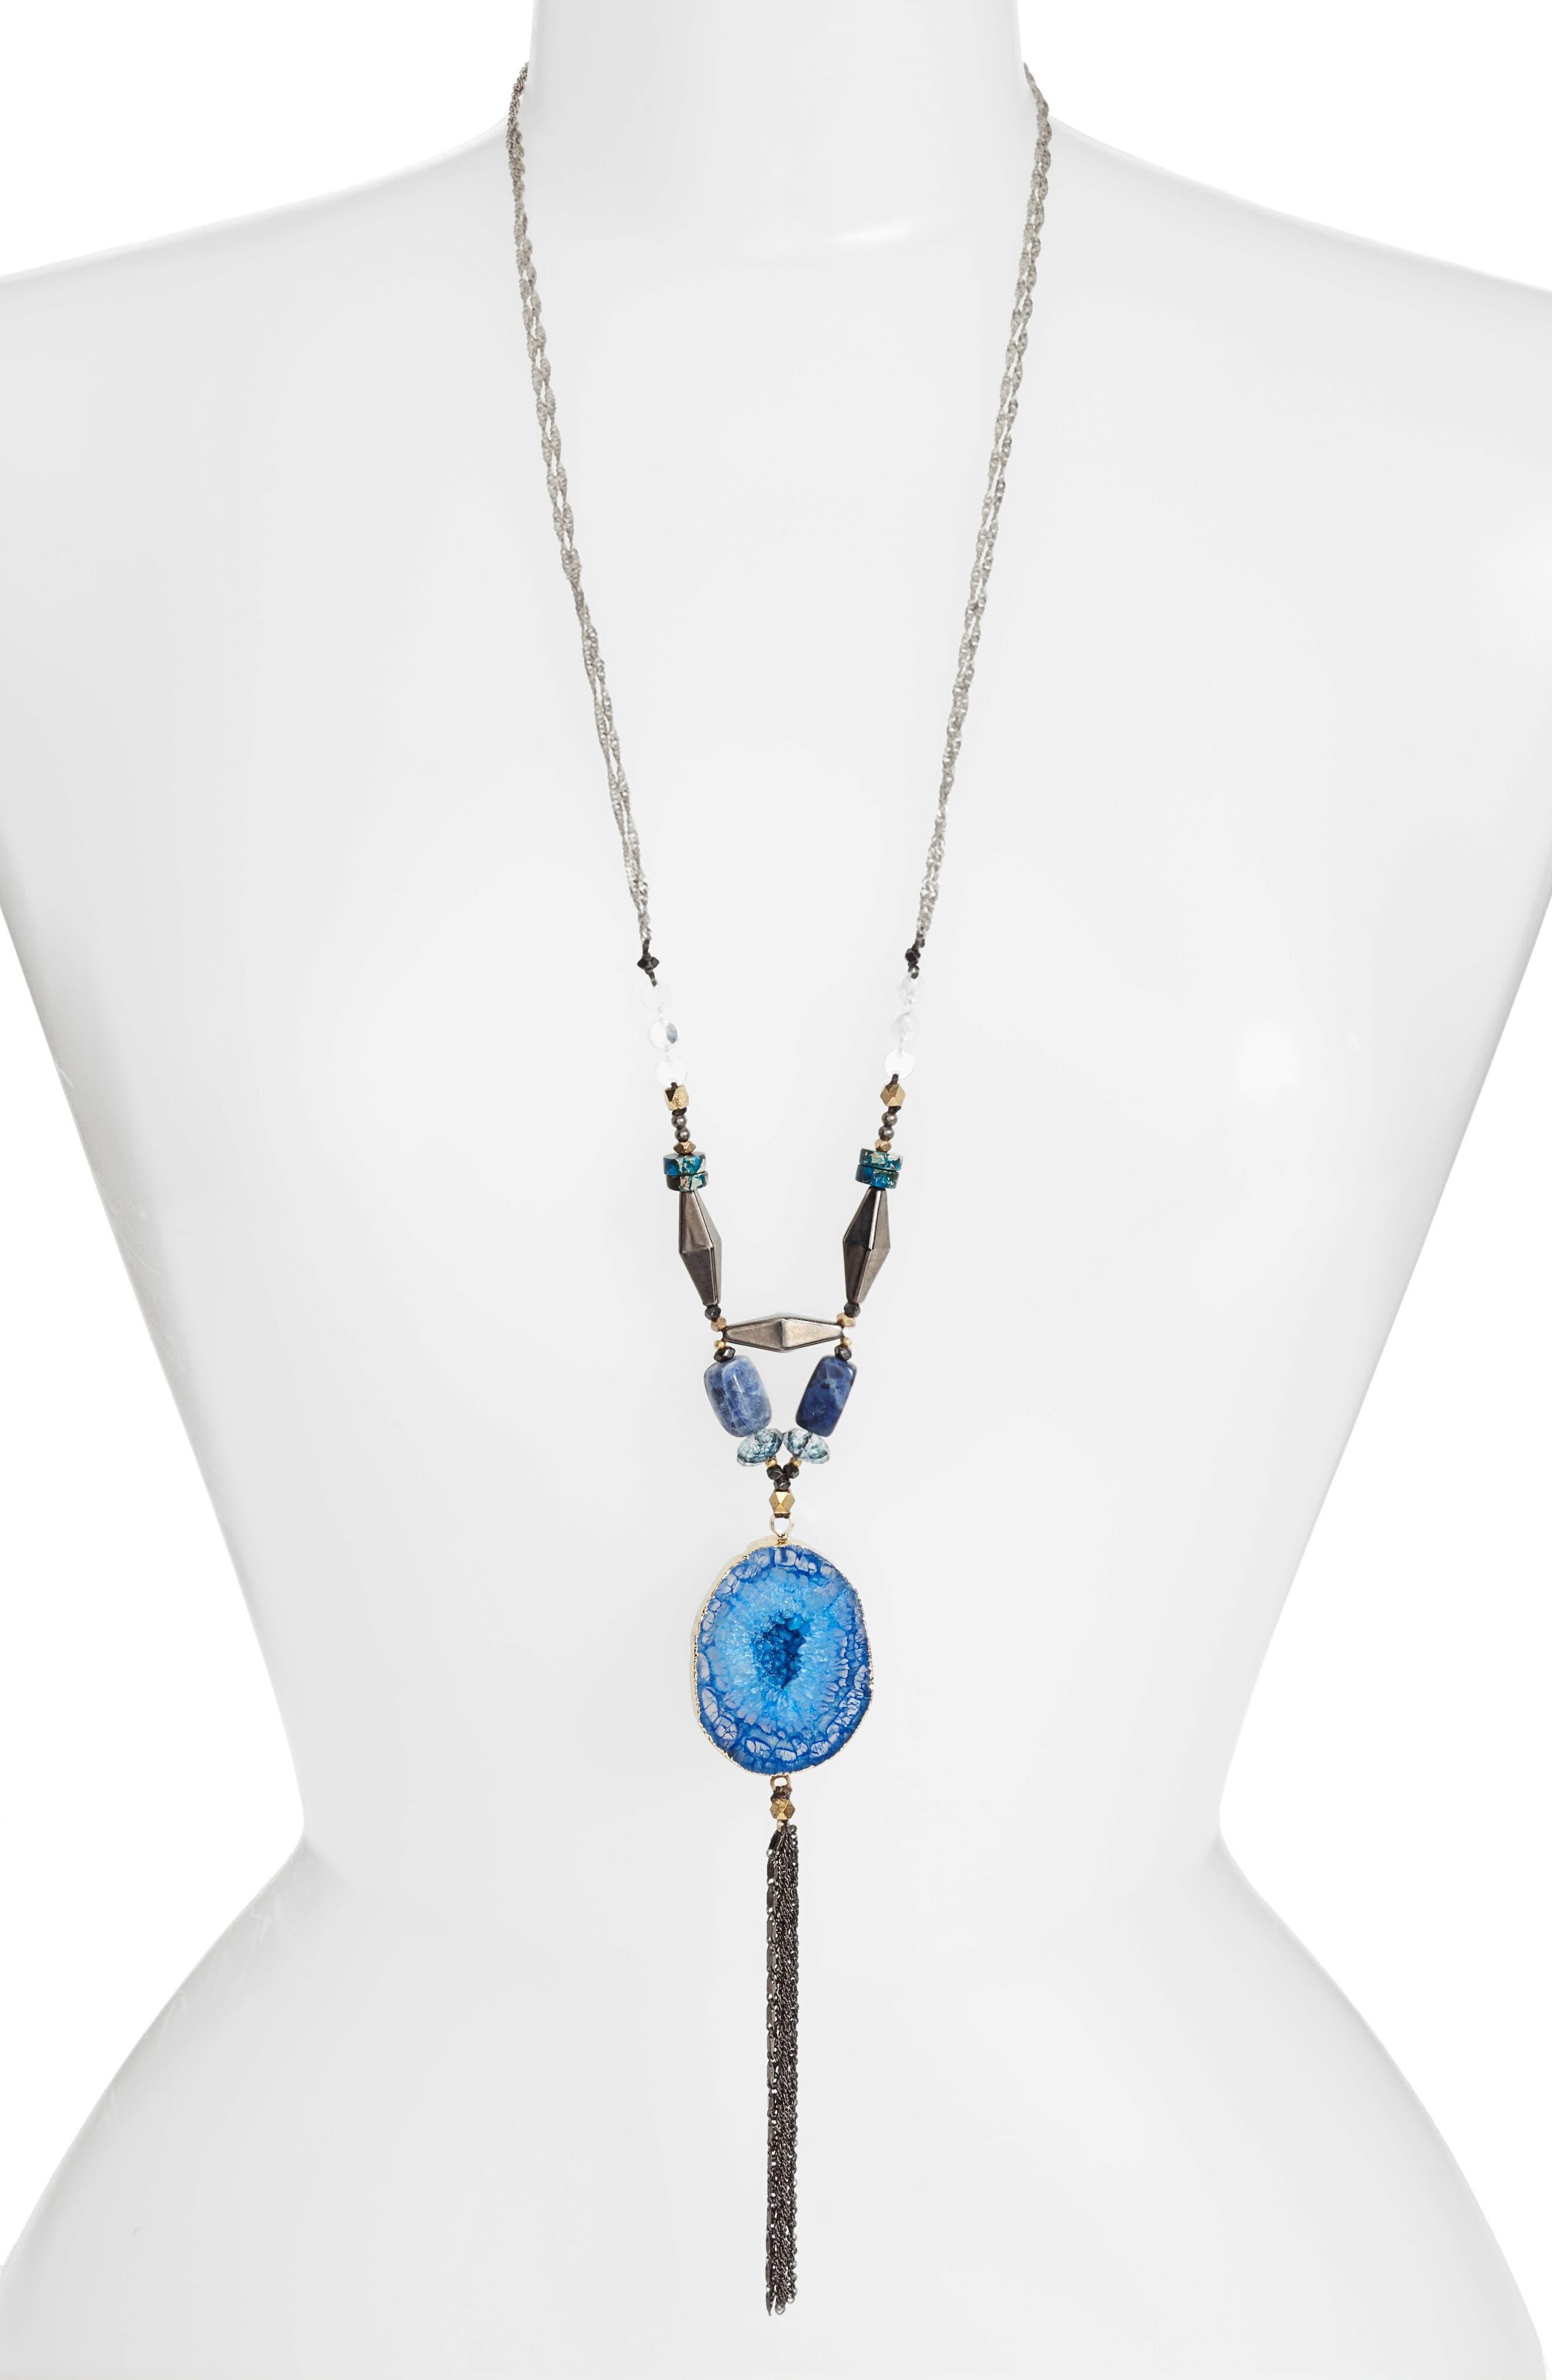 Alternate Image 1 Selected - Nakamol Design Stone Pendant Necklace